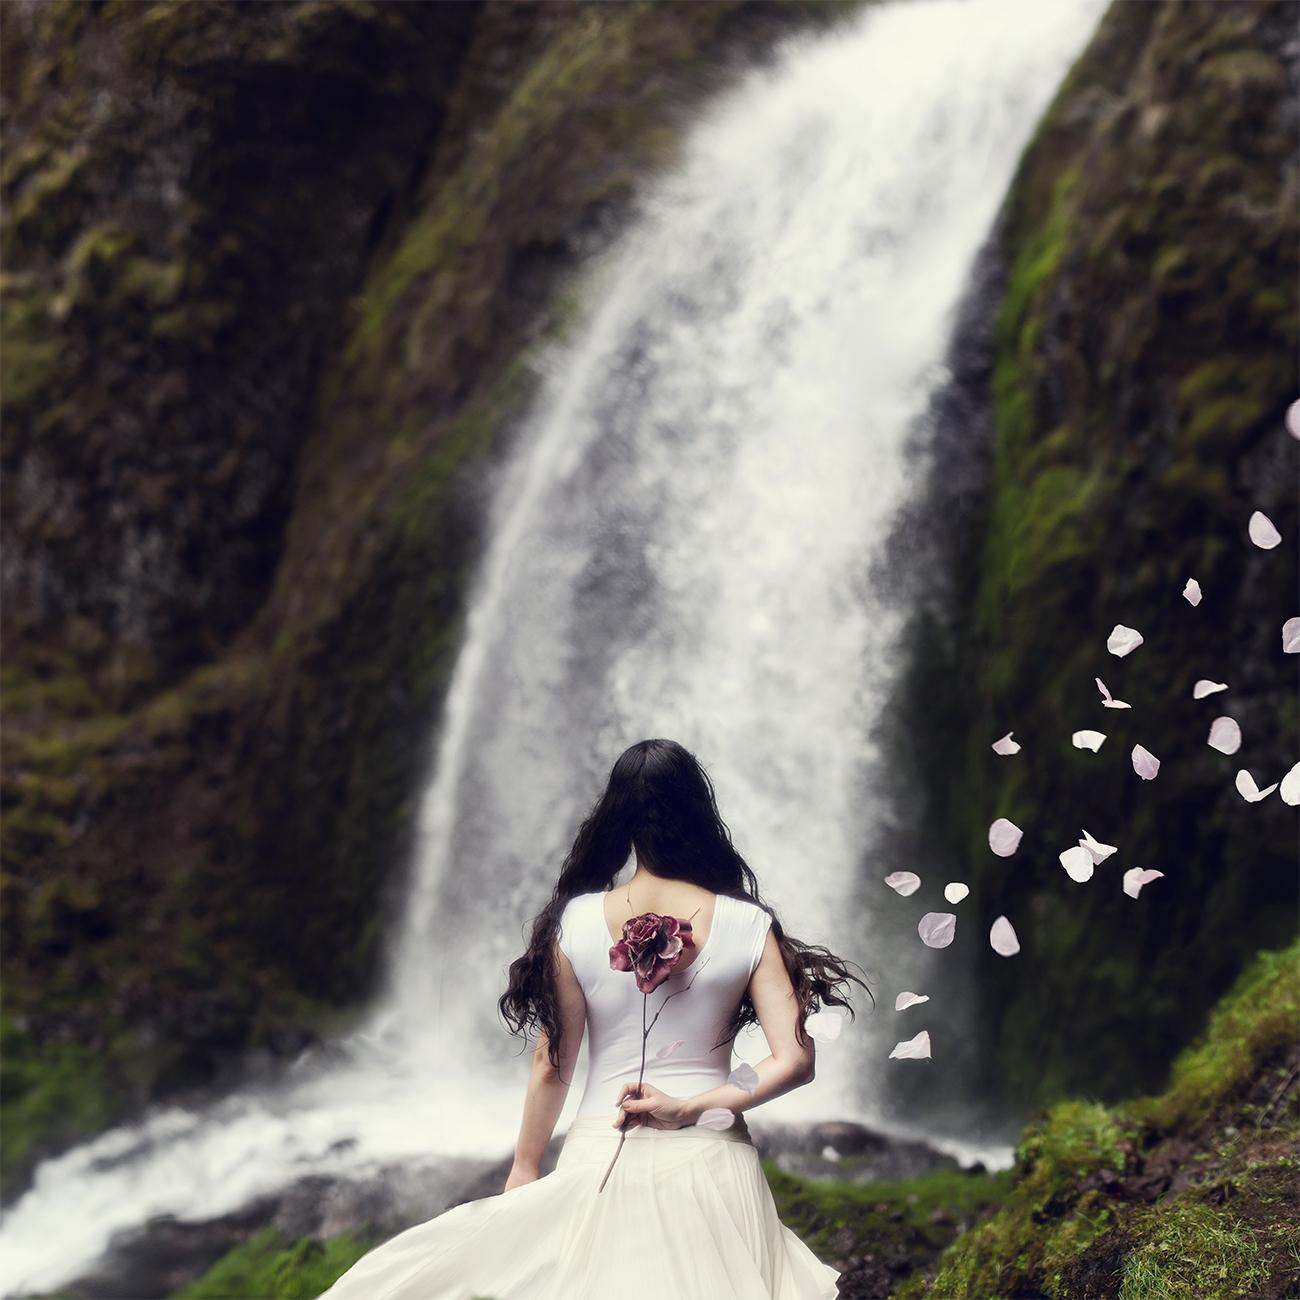 marya_stark_chasing_waterfalls_bliss_rose_composite_photography_elegance_magic_healing_waters.jpg